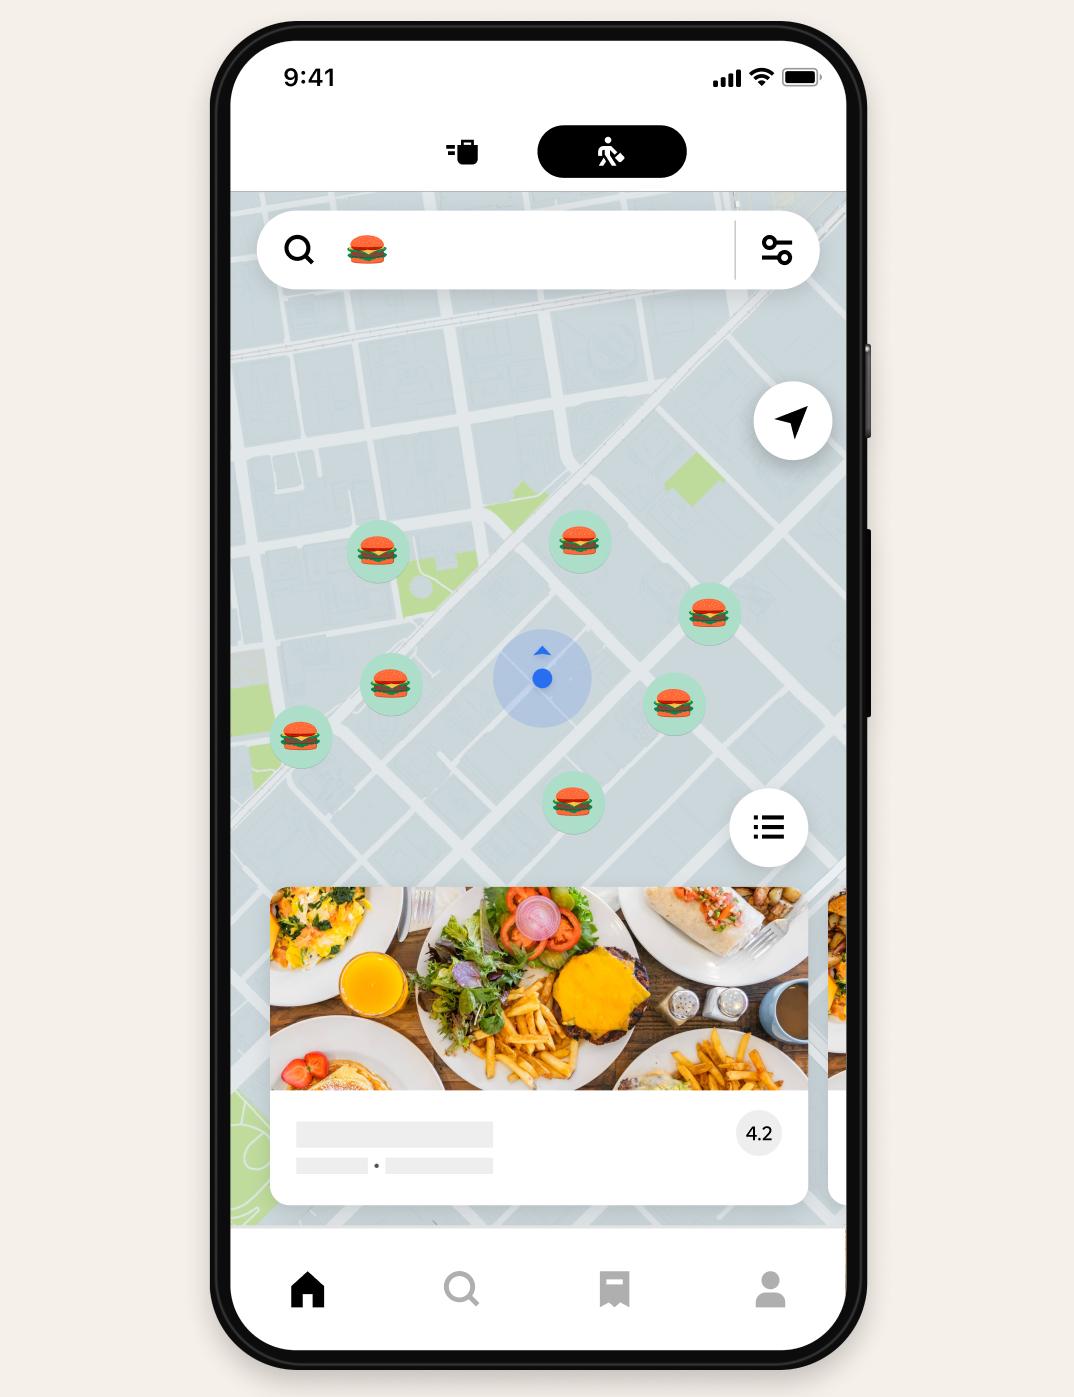 Uber Eats map interface